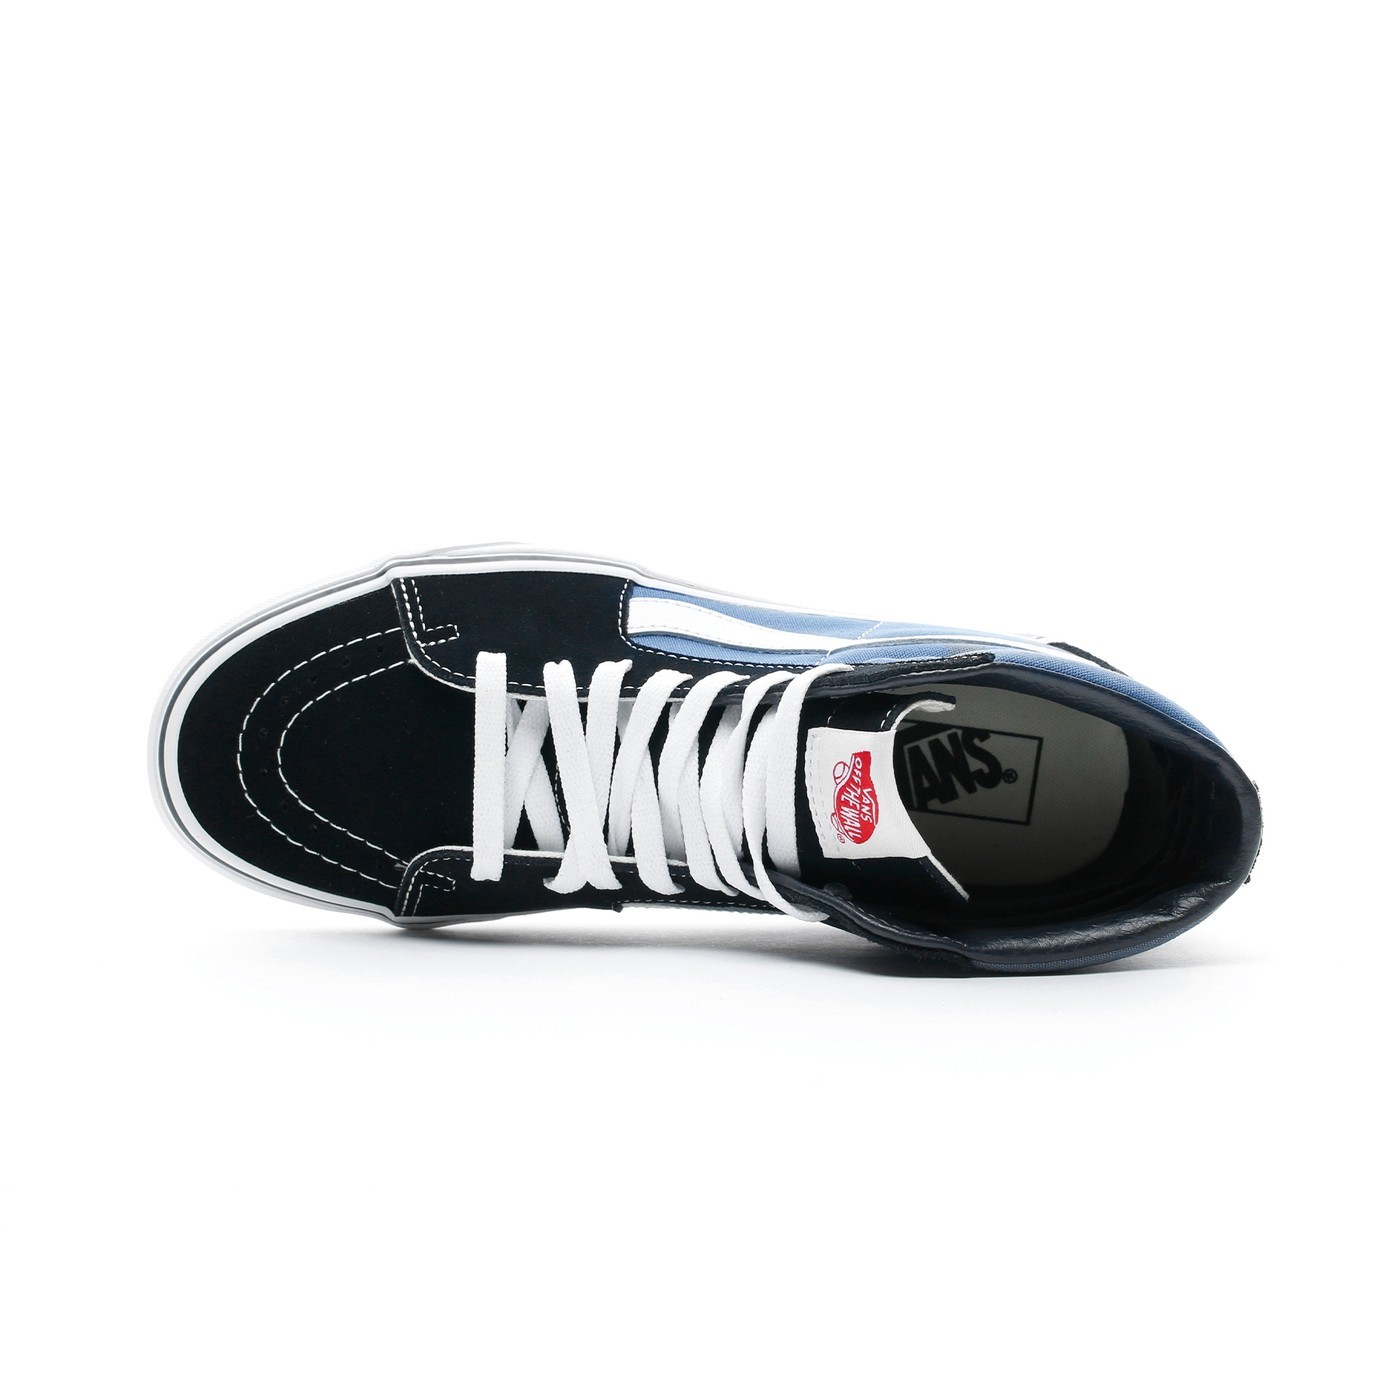 Vans Sk8-Hi Mavi - Siyah Erkek Sneaker